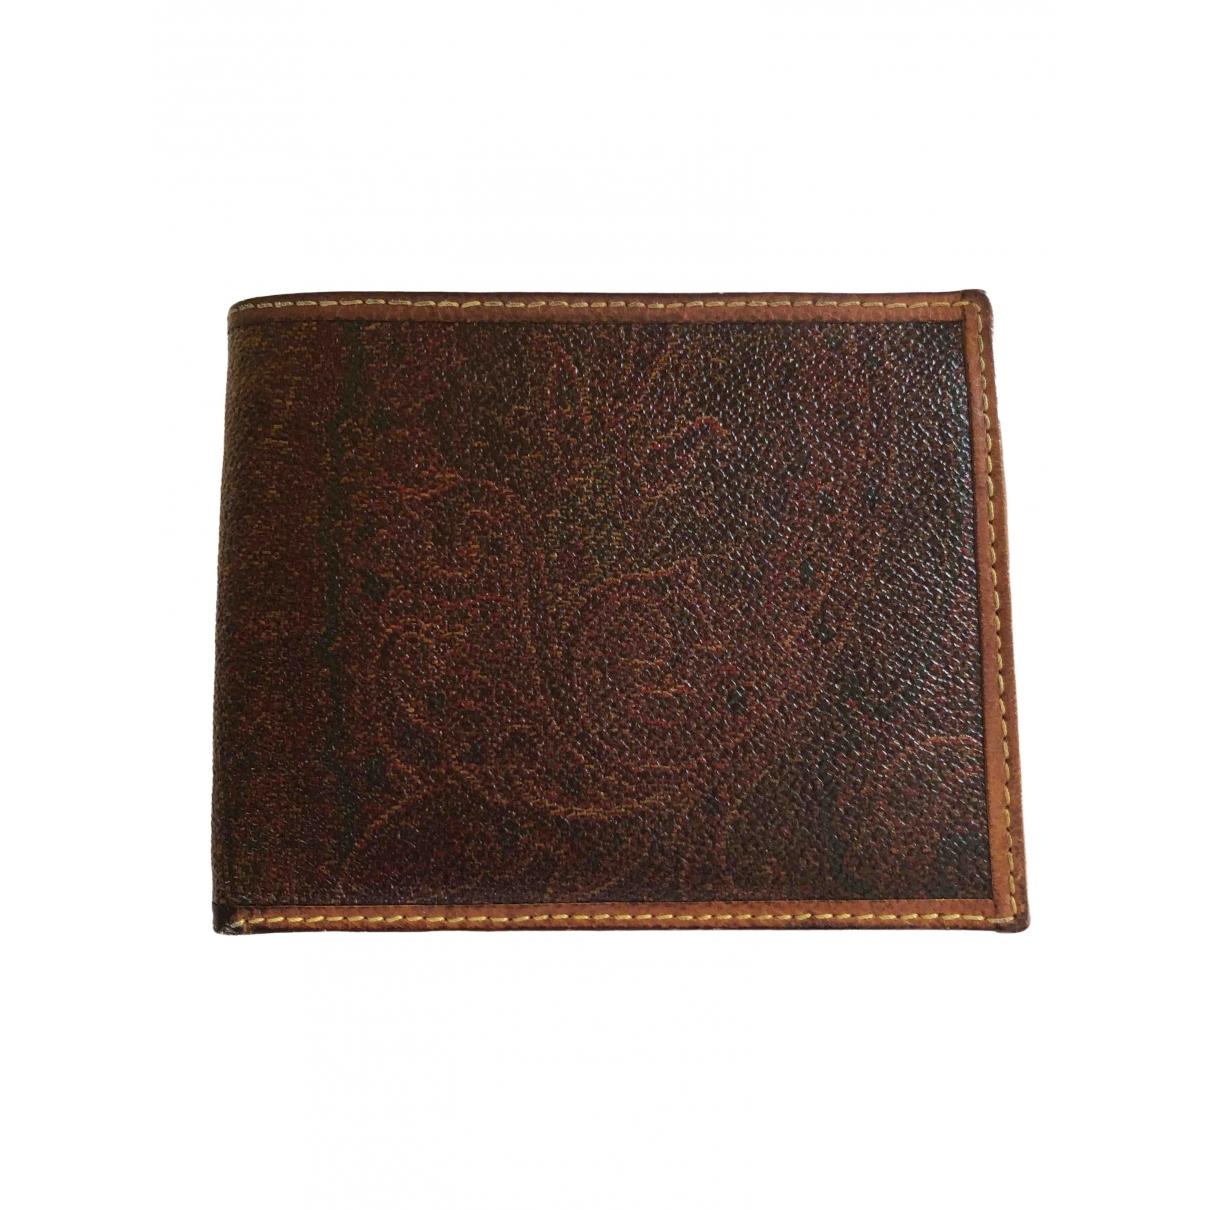 Etro \N Multicolour Leather wallet for Women \N